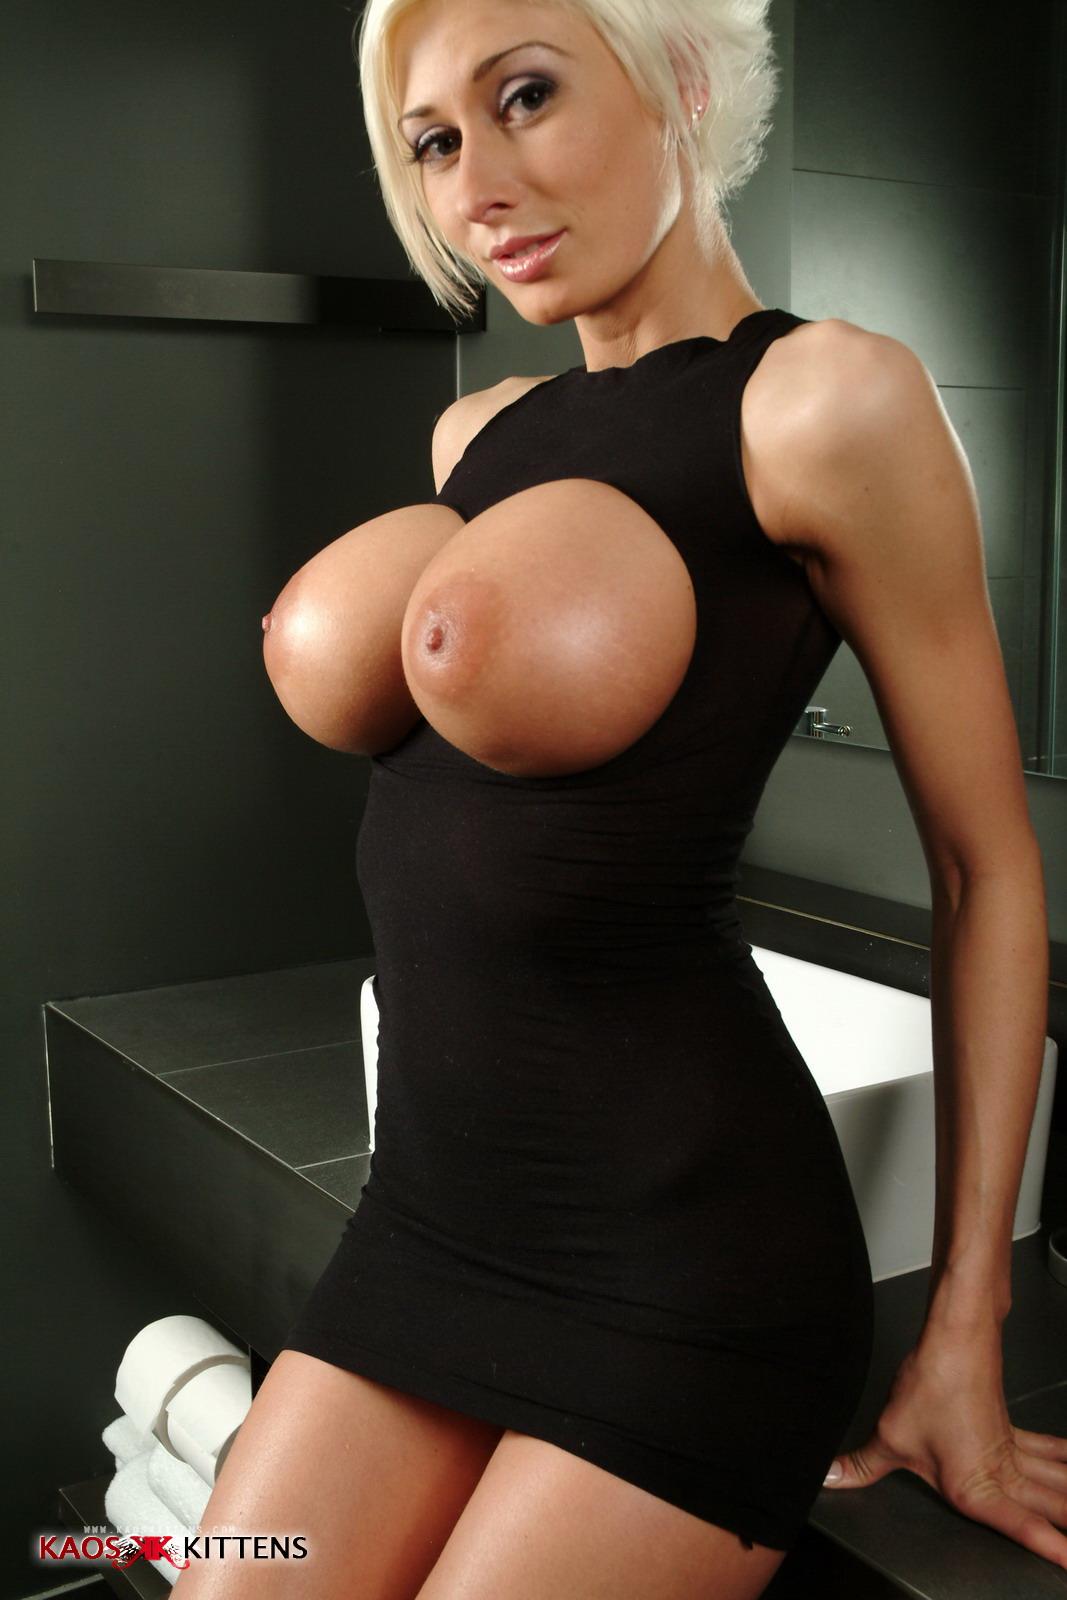 huge-boobs-tits-naked-mix-vol5-40